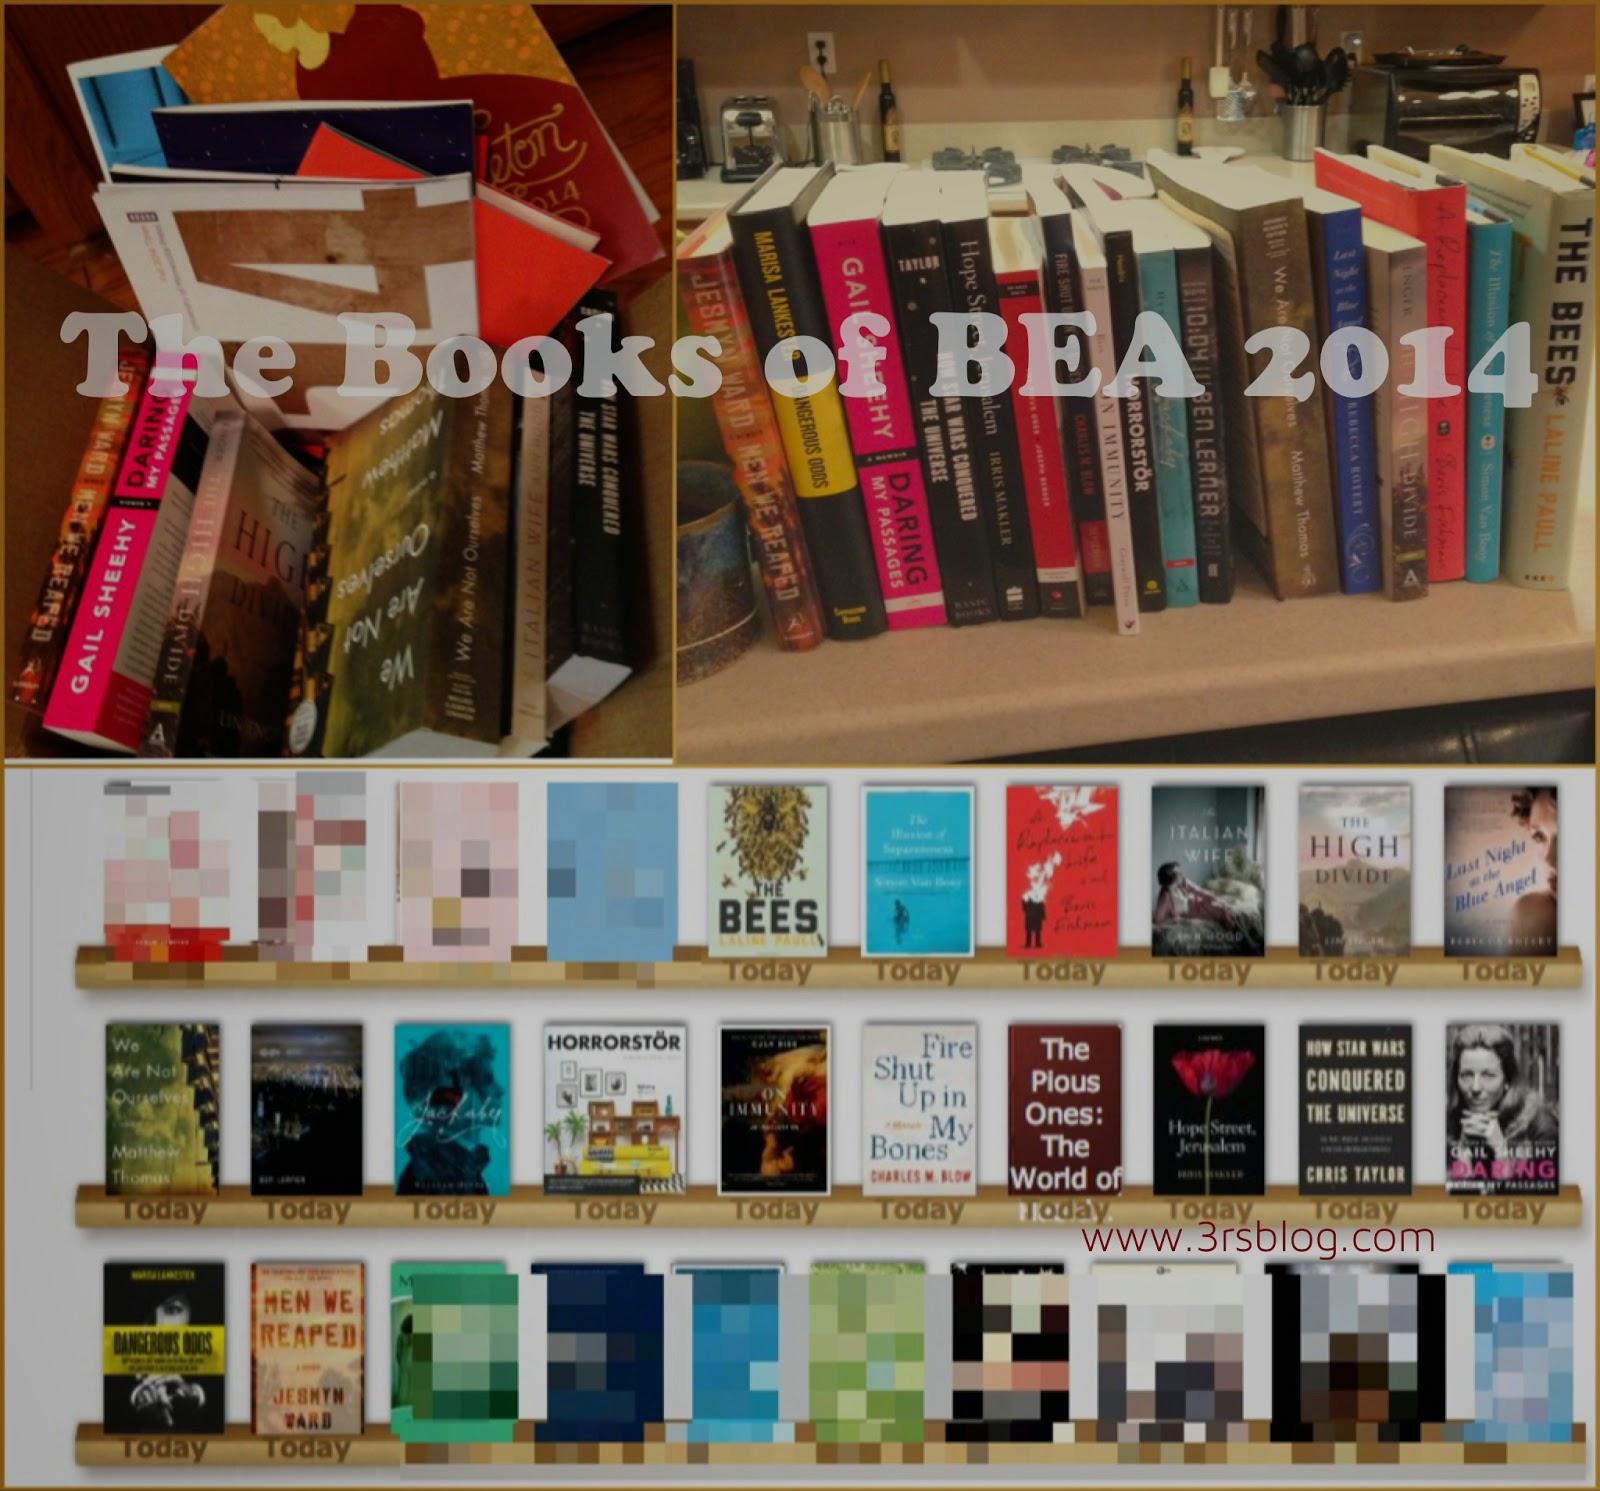 BEA 2014 books 3rsblog